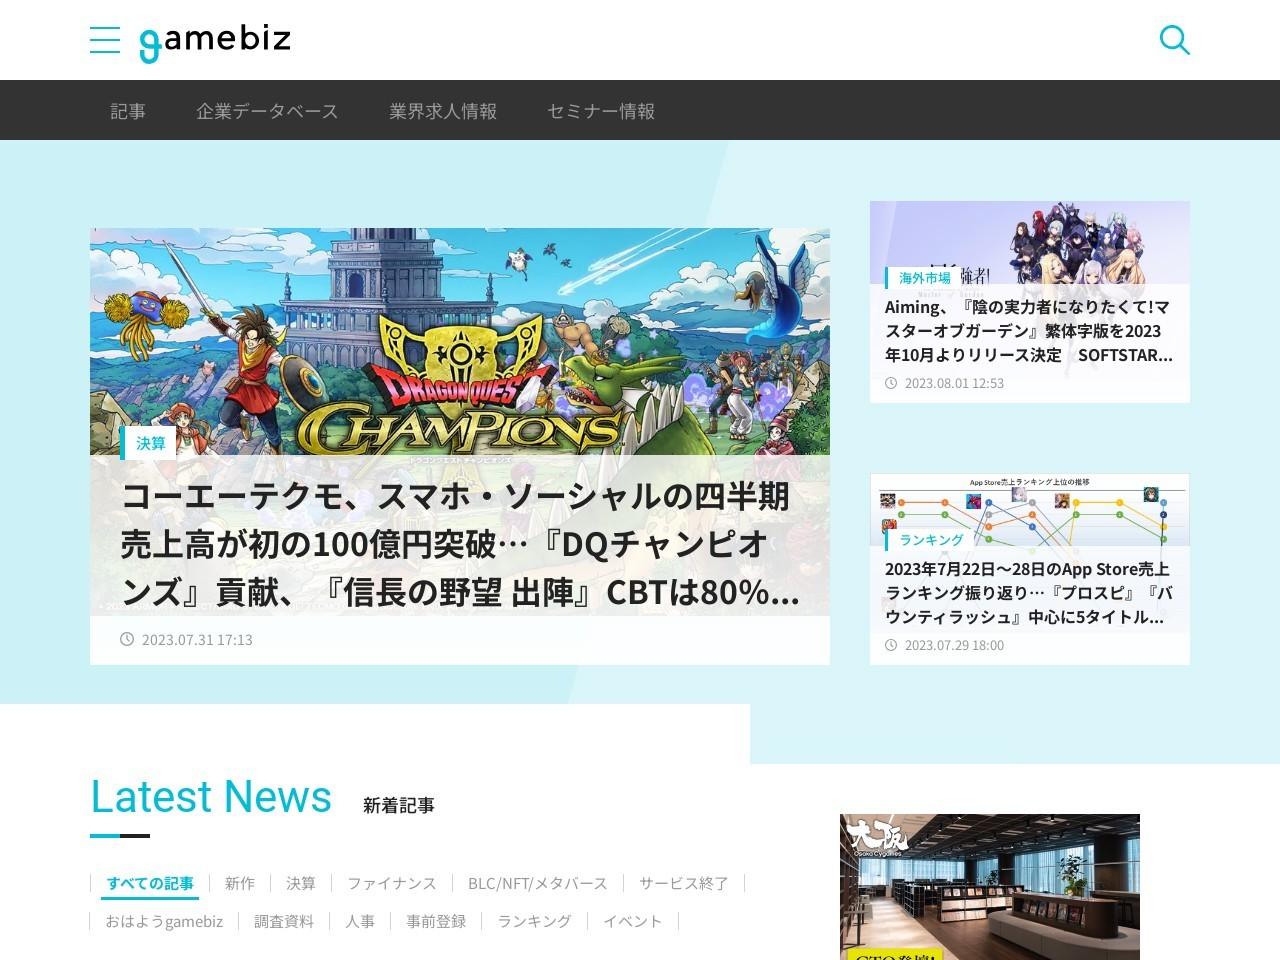 【Google Playランキング(10/19)】「第13章 センテリュオ動乱」開始の『白猫PJ』が83ランクアップ 『プリコネ …